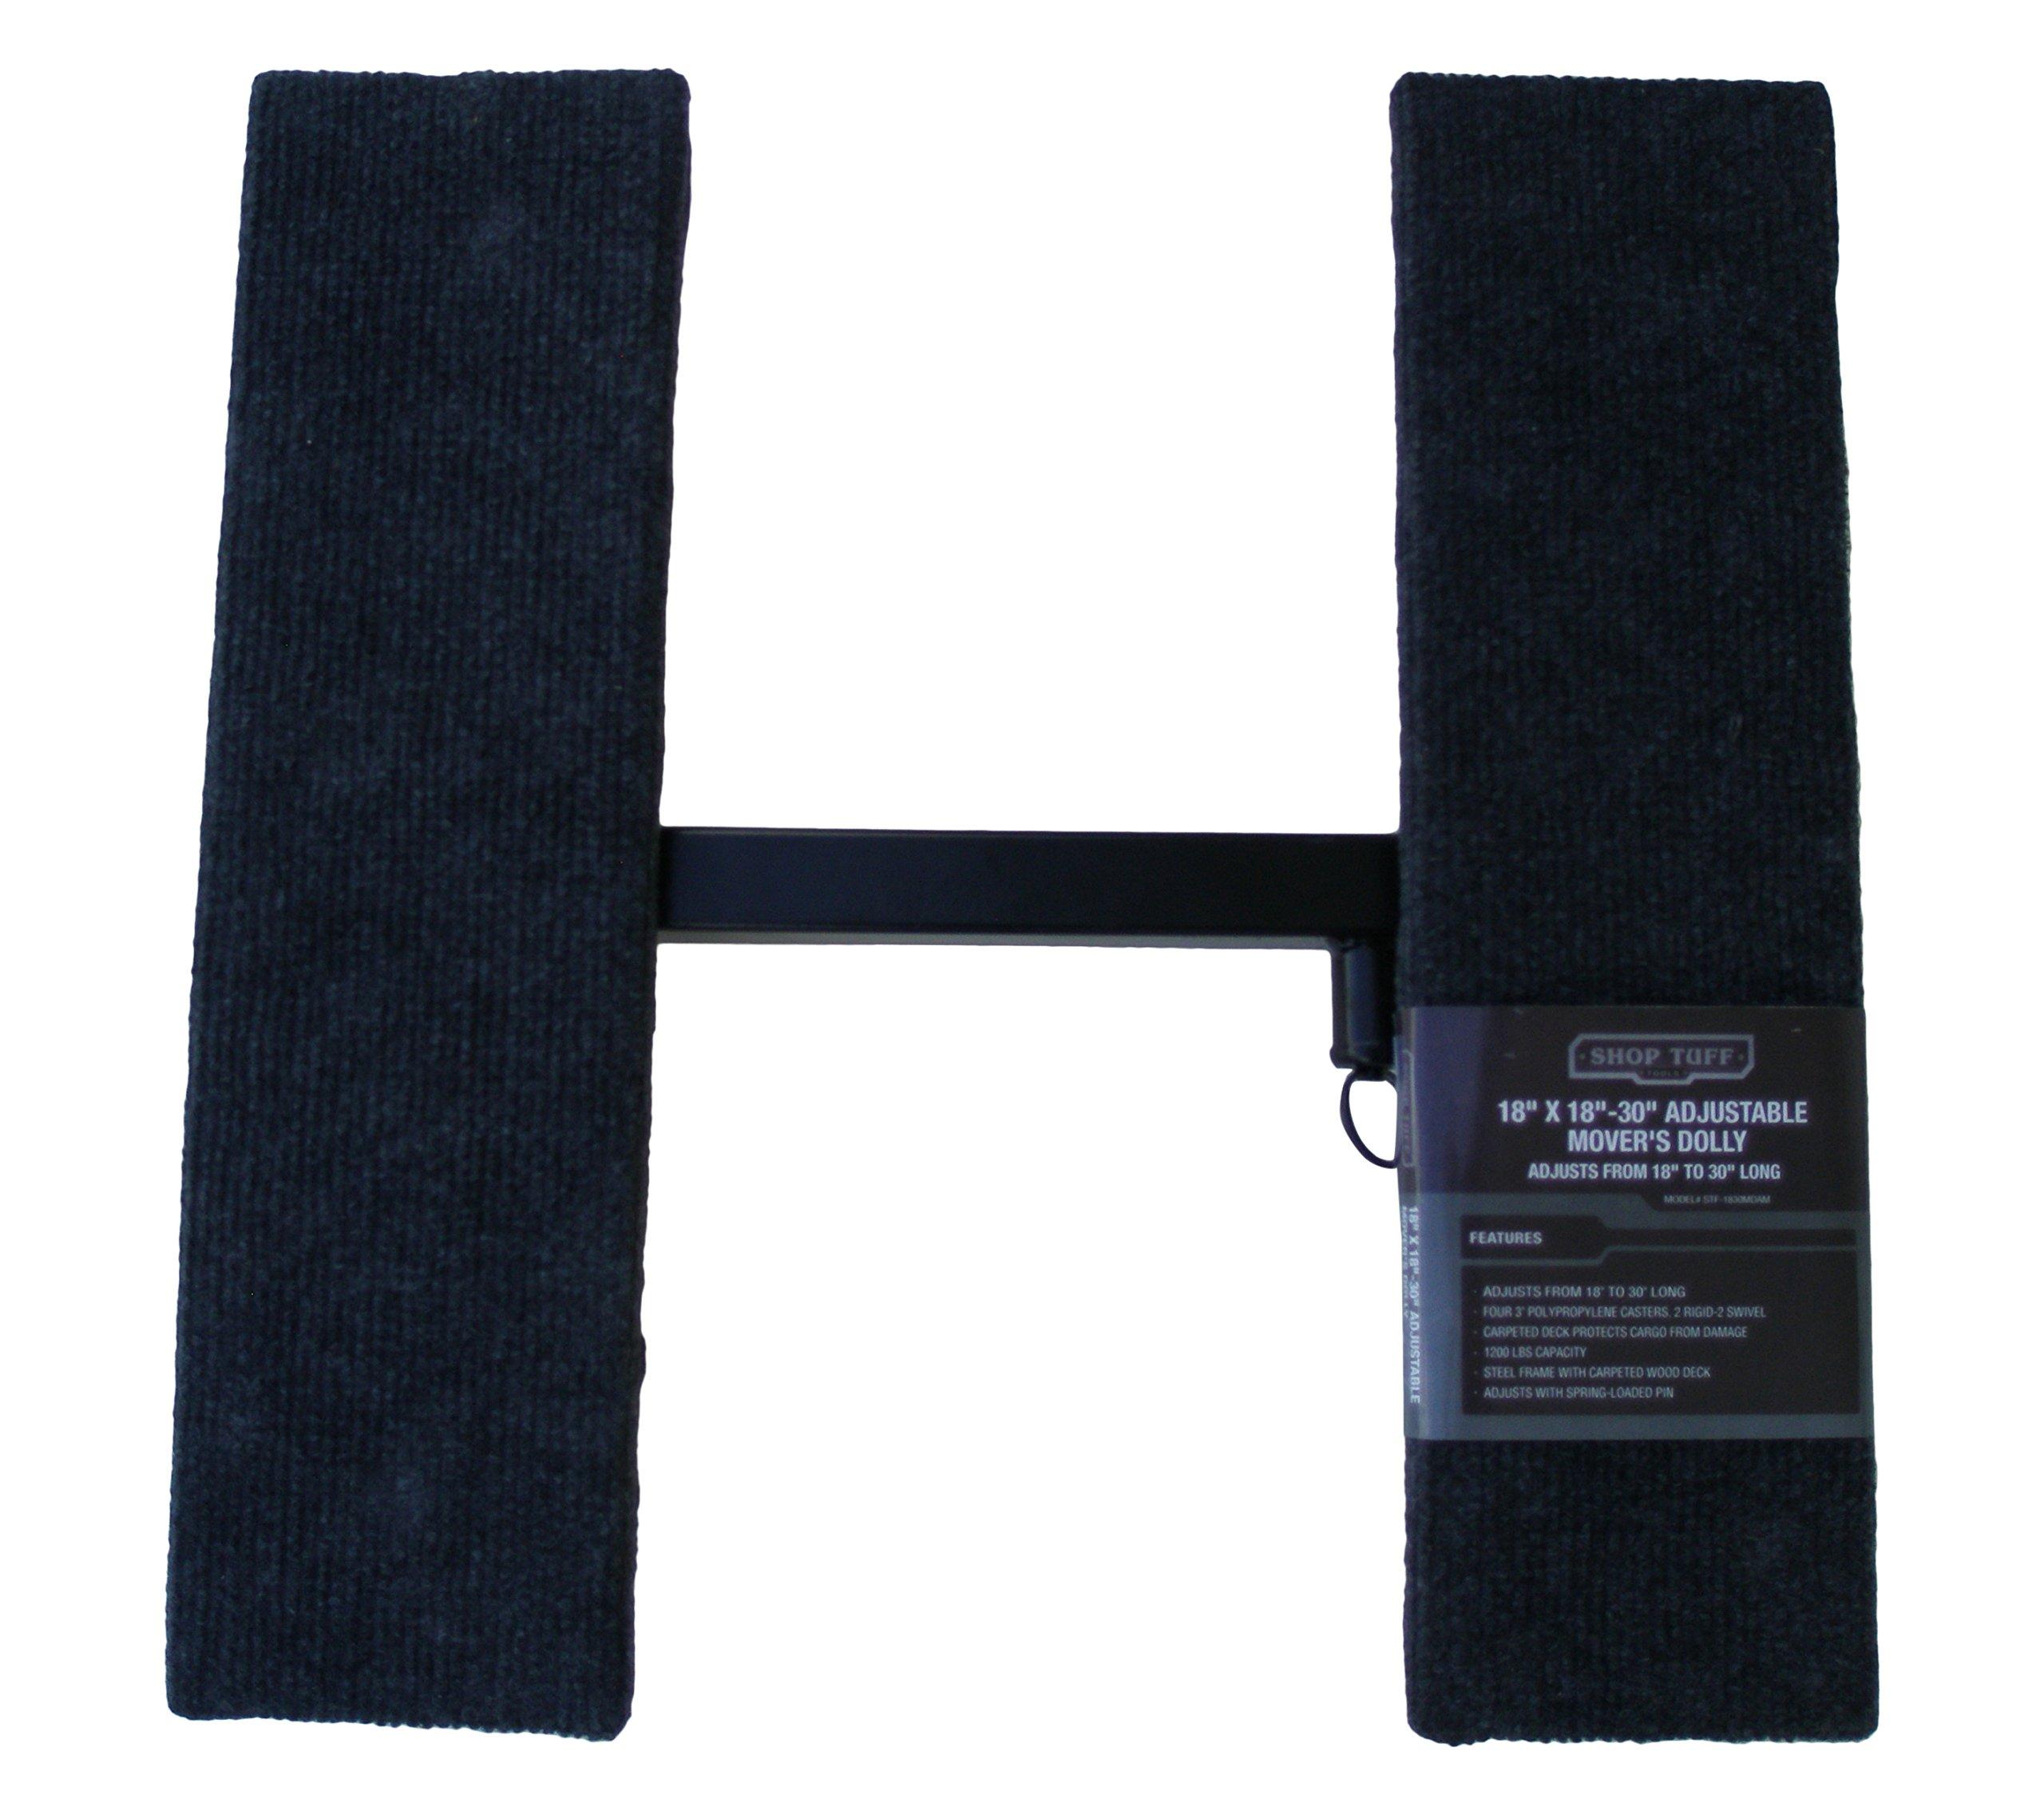 Shop Tuff STF-1830MDAM Adjustable Mover's Dolly, 18'' x 18'' x 30''